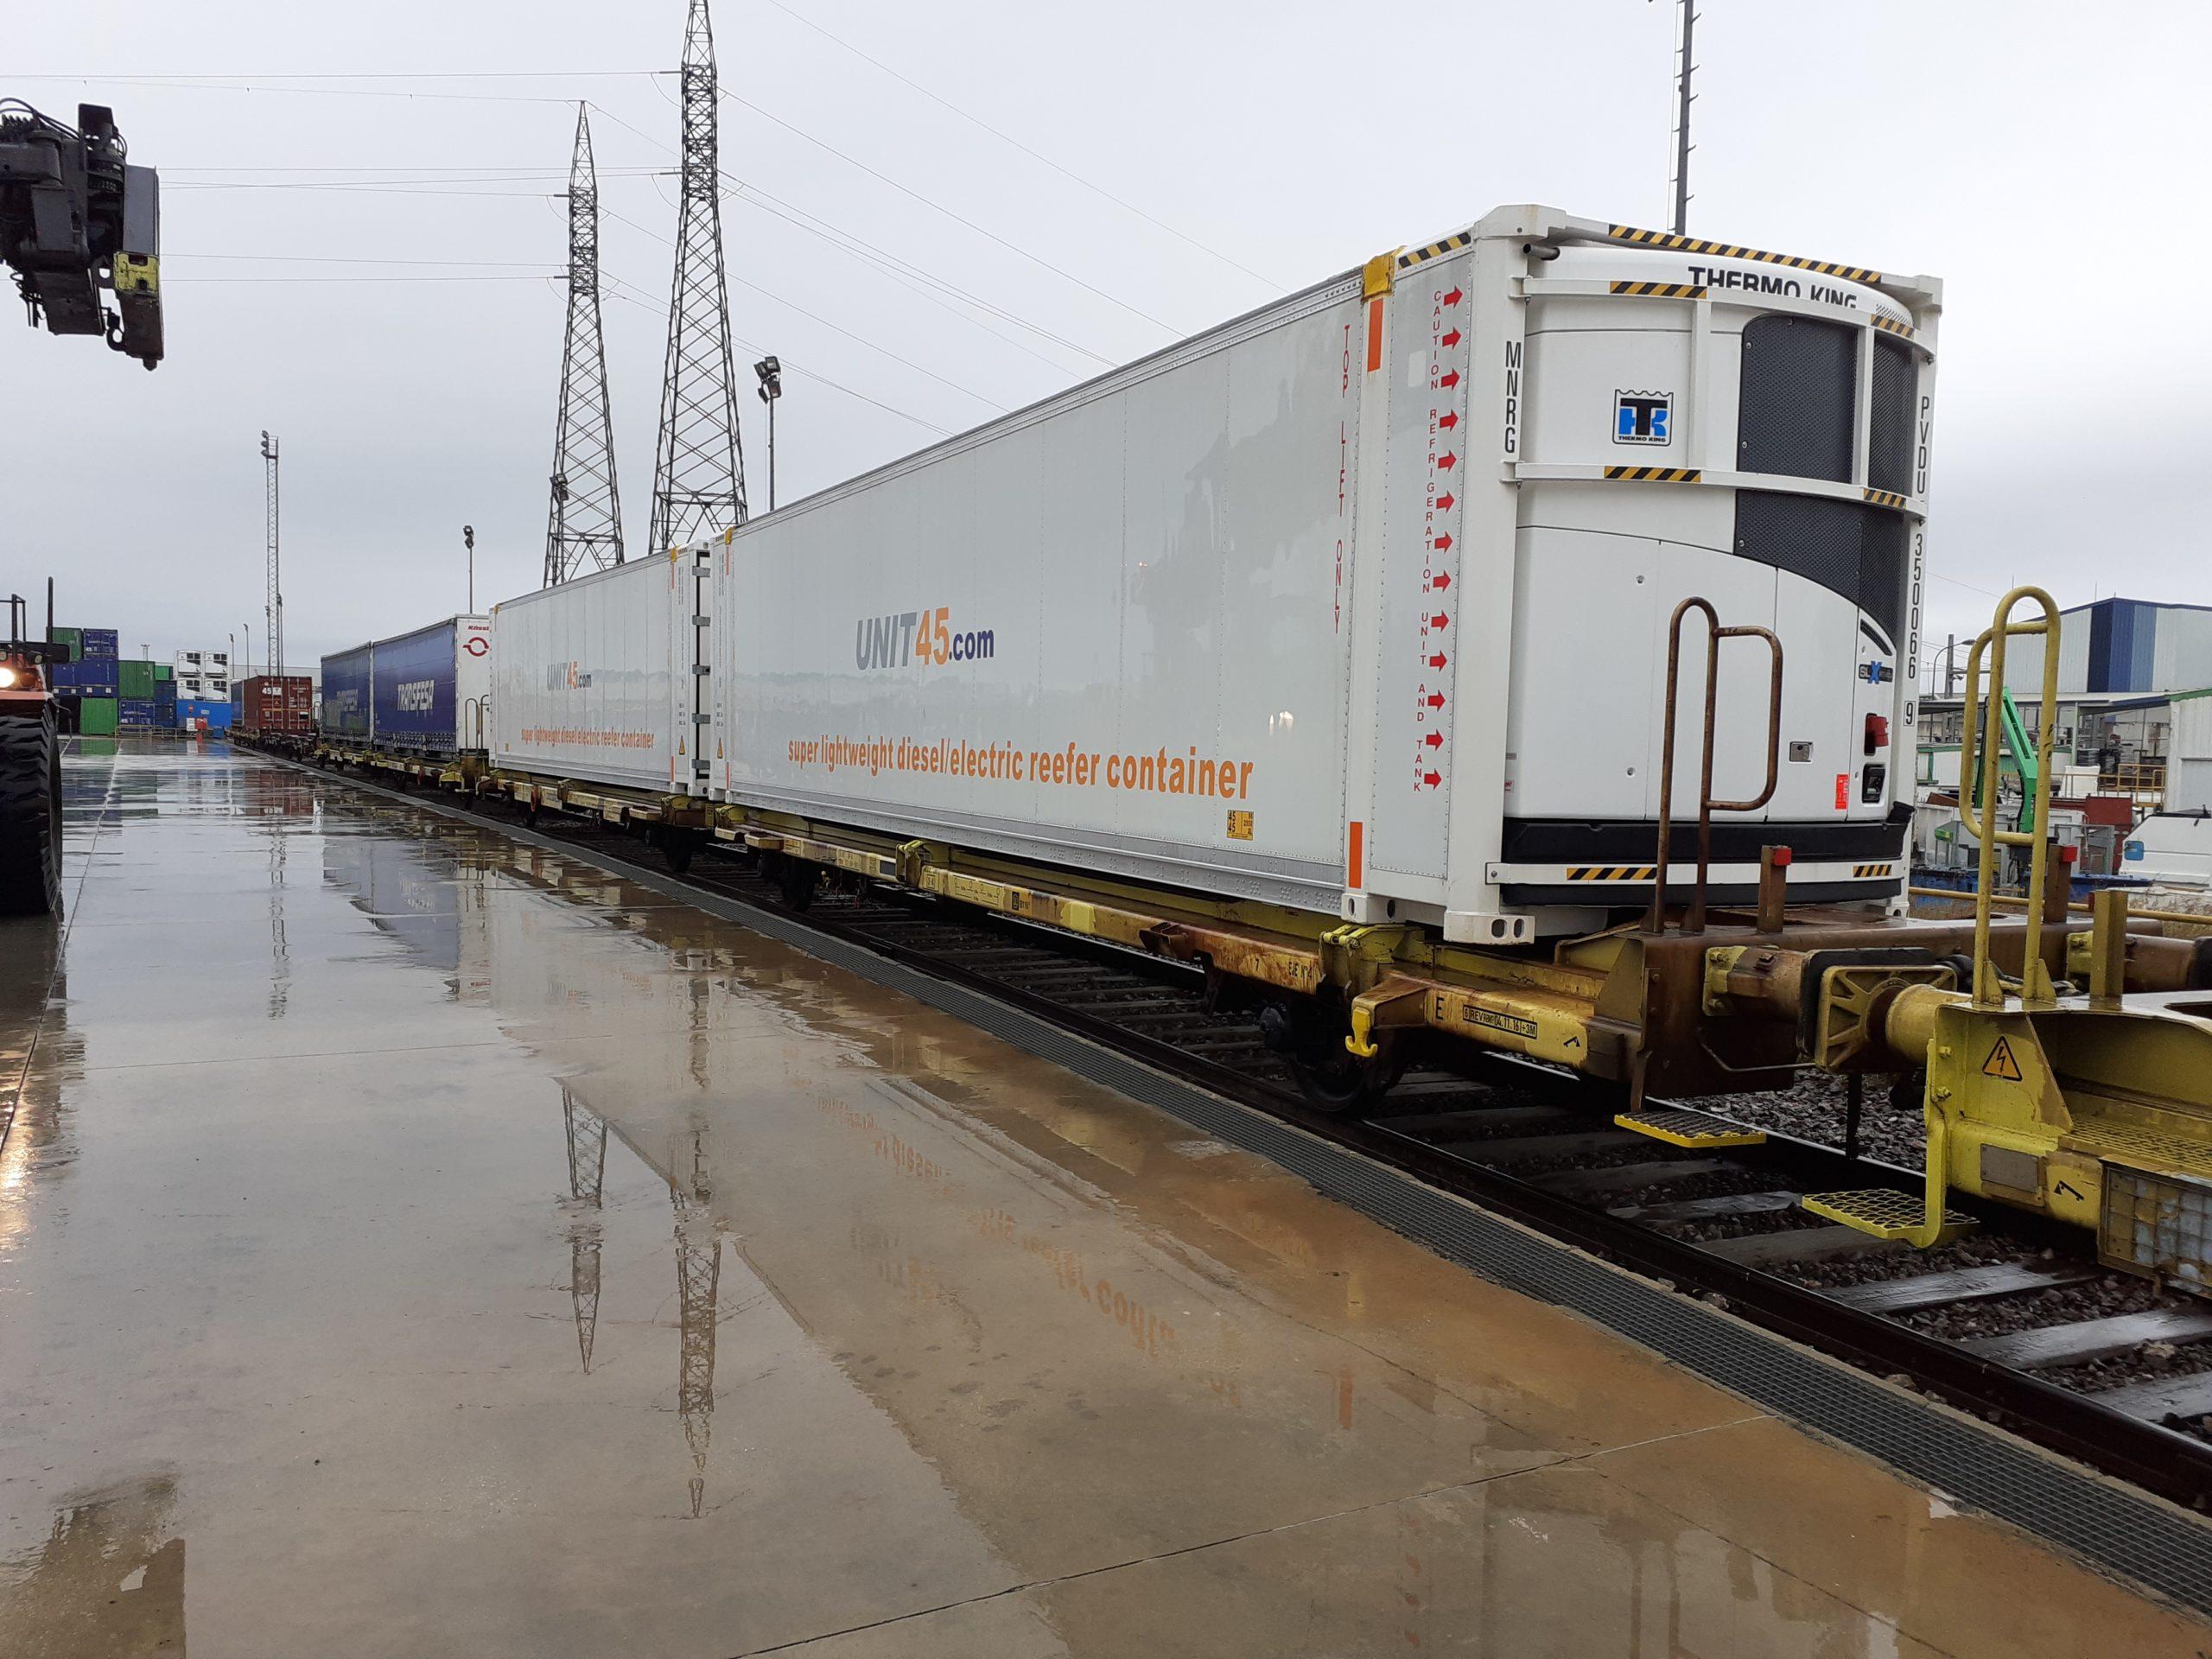 Transfesa Logistics refrigerated car